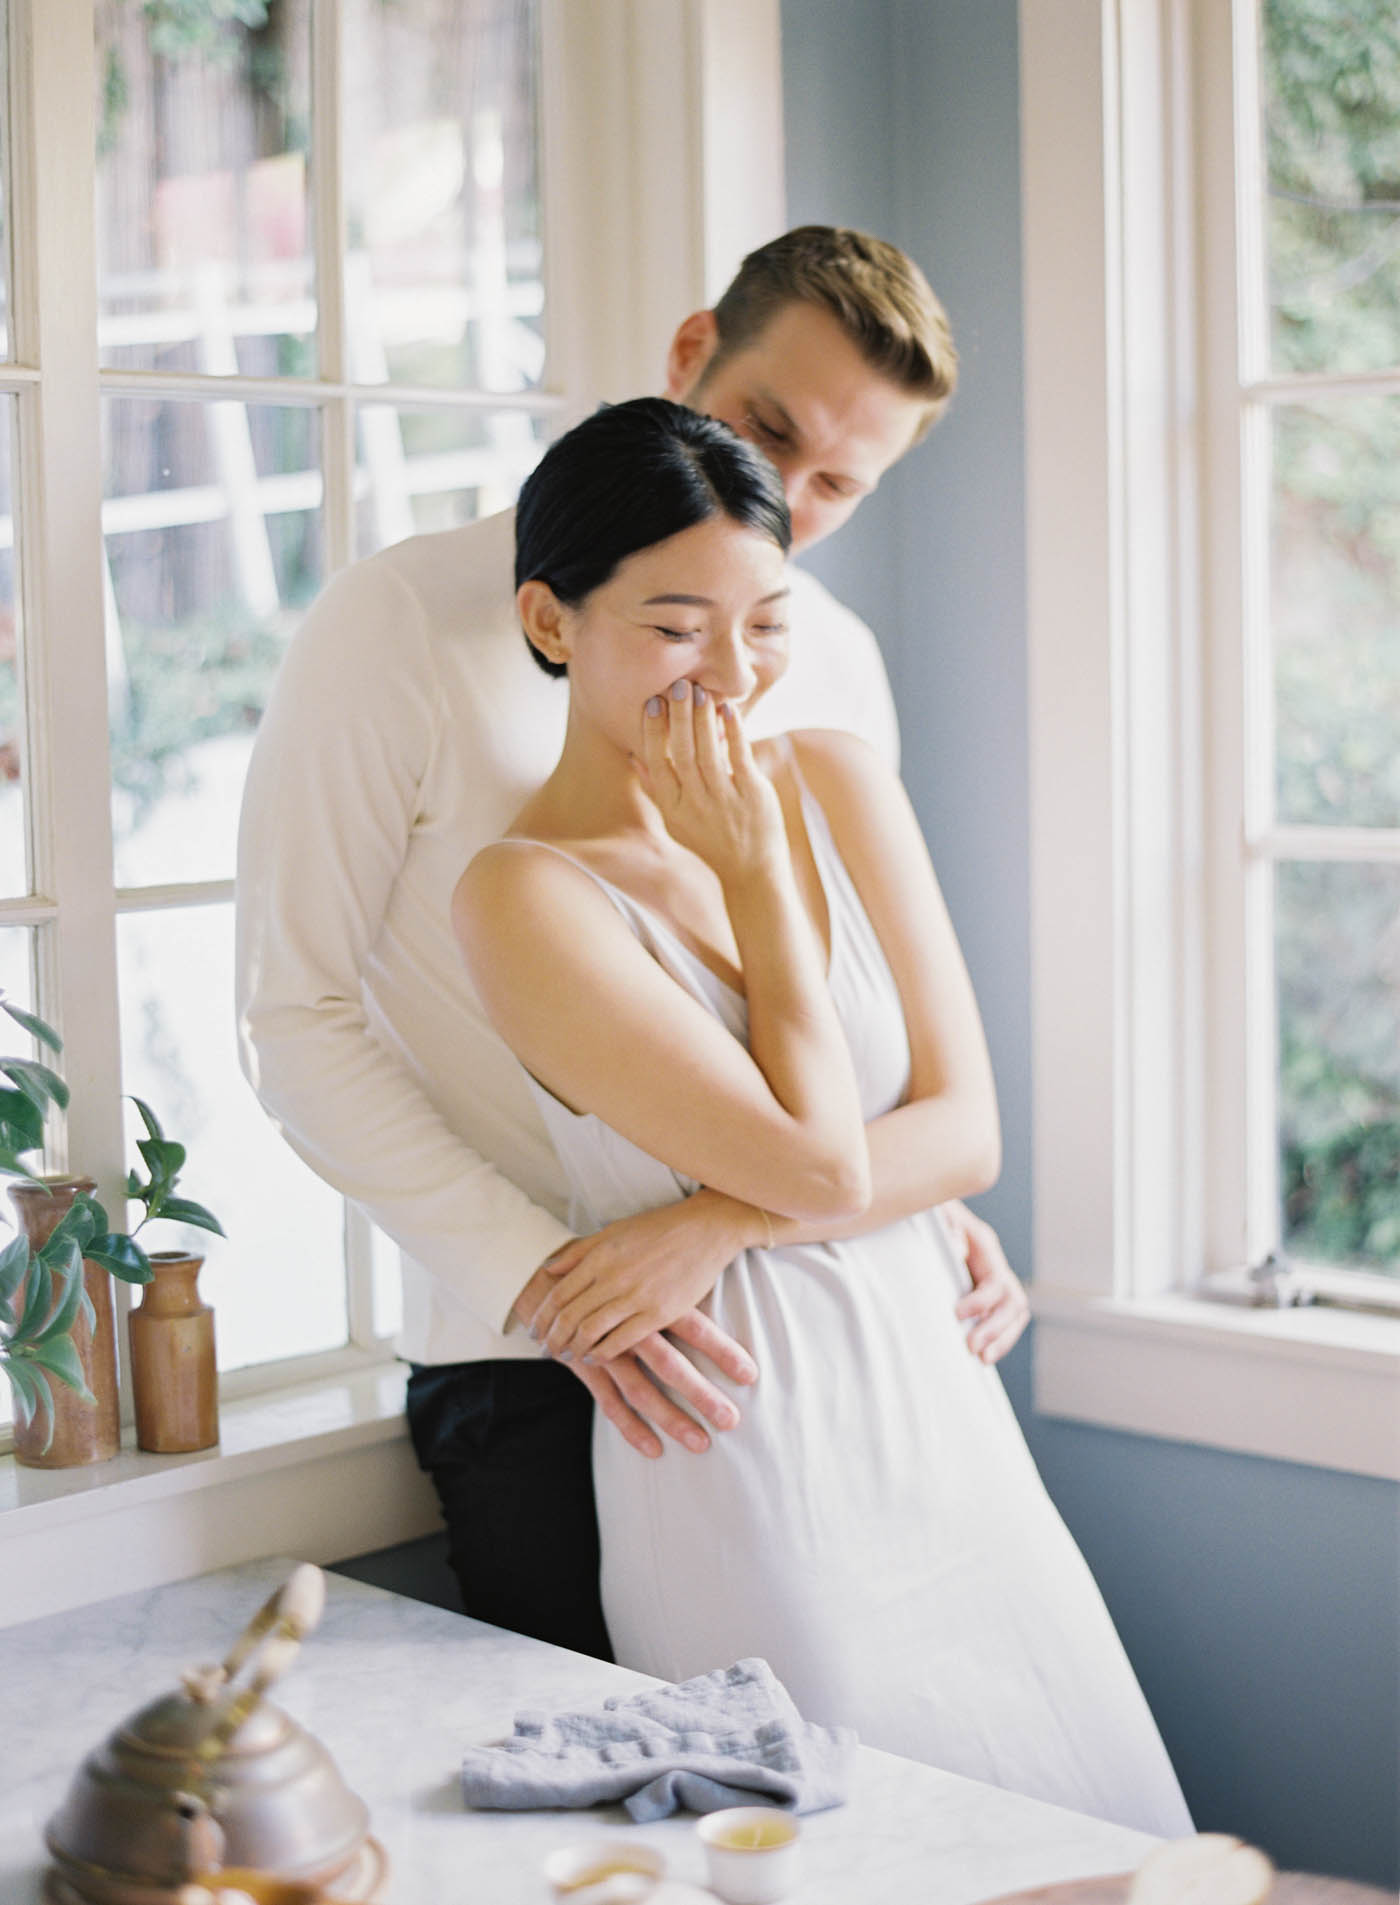 riviera-house-engagement-117-Jen_Huang-Tea-Ceremony-366-Jen_Huang-004147-R1-009.jpg